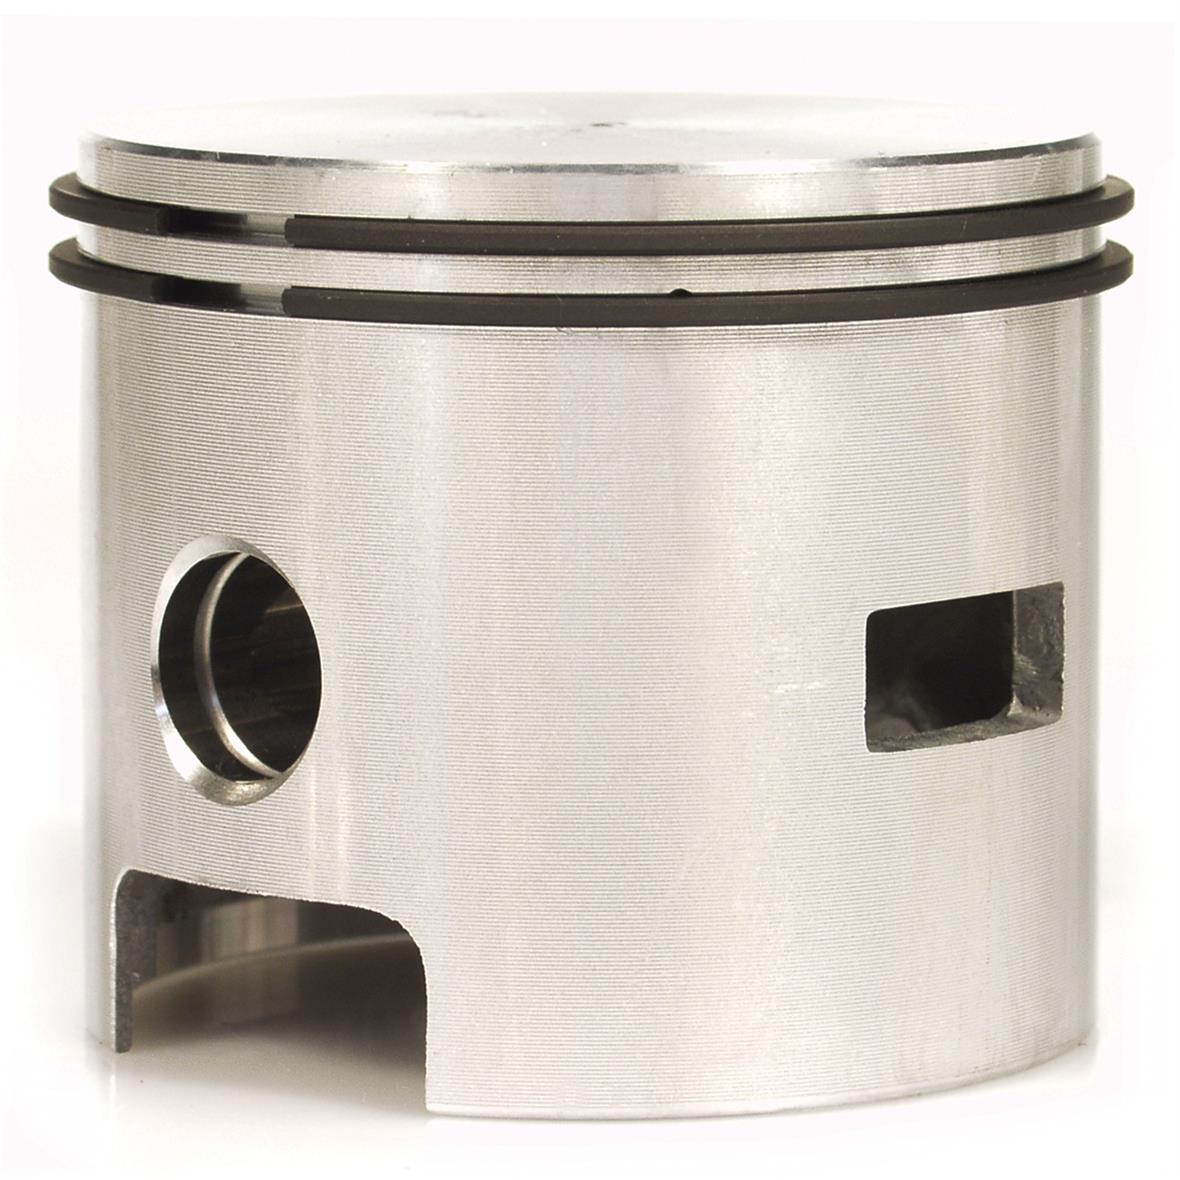 Produktbild für 'Kolben PINASCO A 102 ccm'